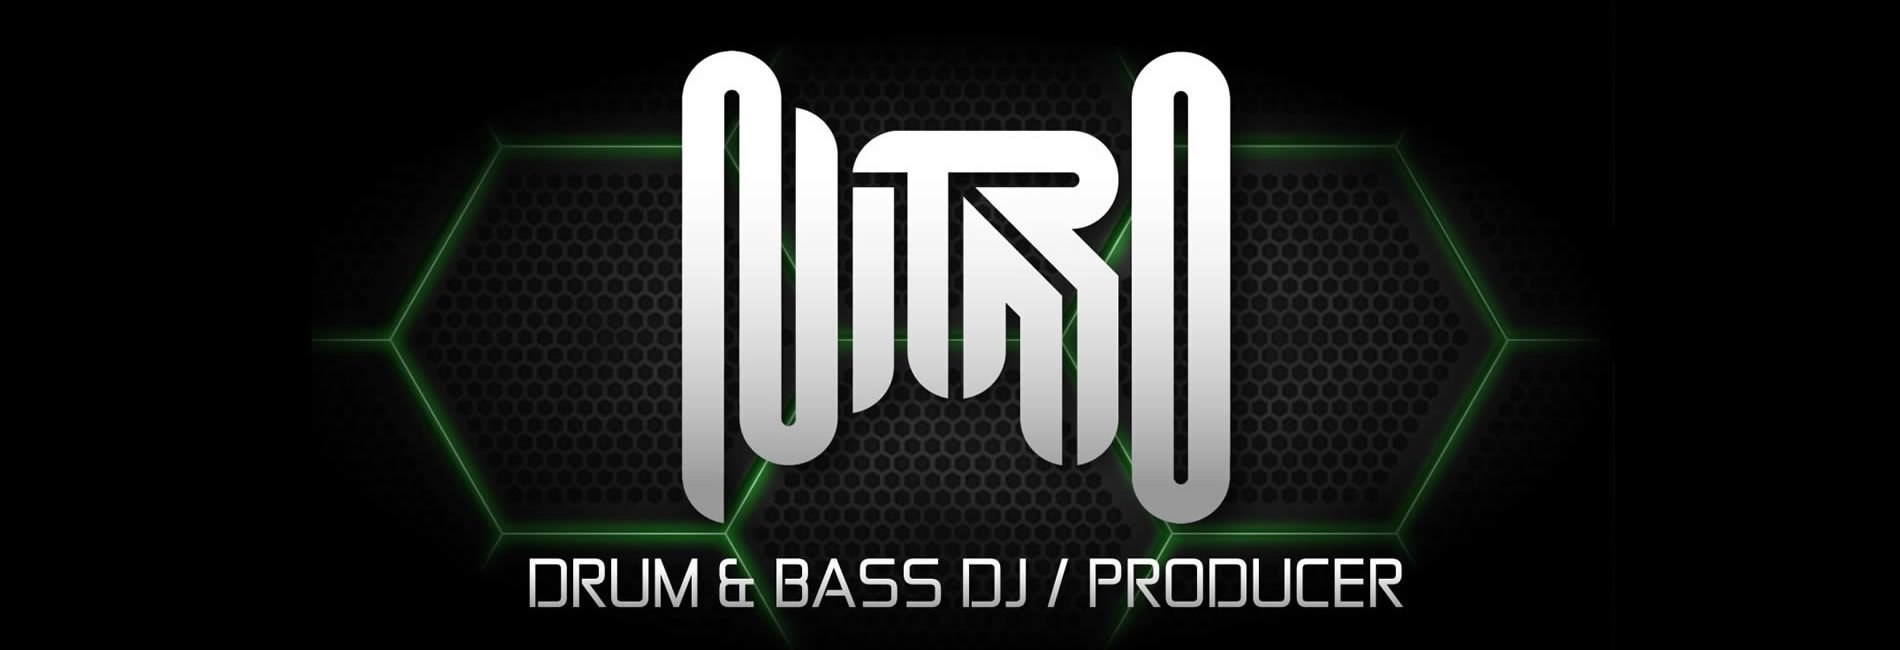 Mr Nitro UK Drum & Bass DJ / Producer